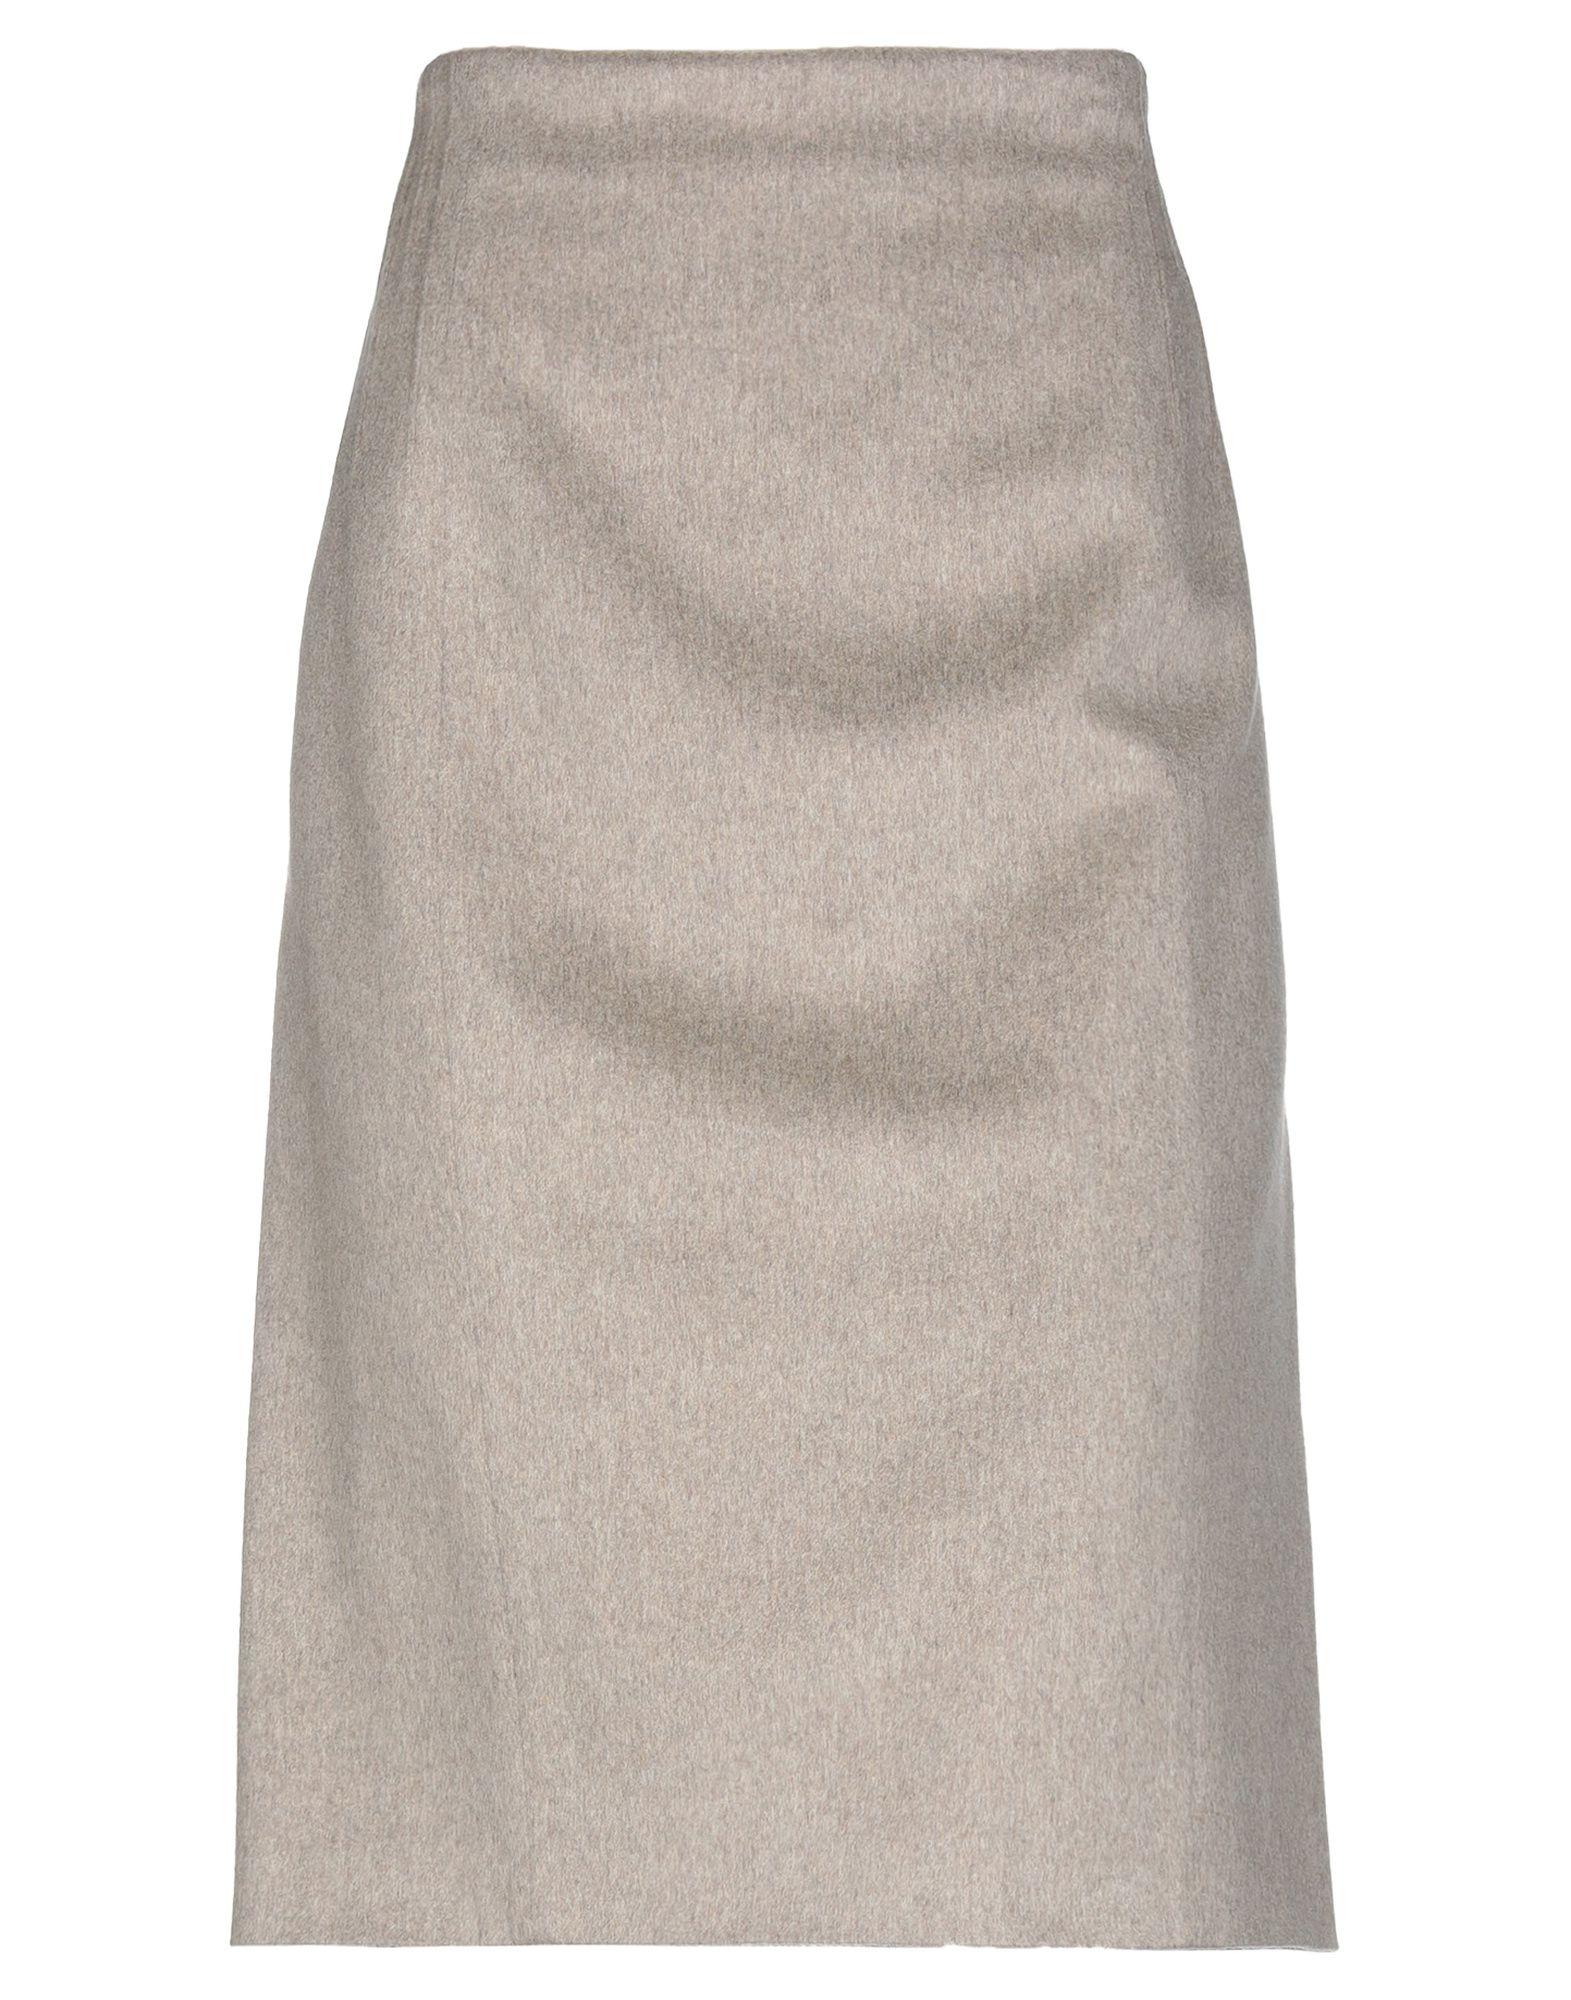 ARMANI COLLEZIONI Юбка длиной 3/4 armani collezioni юбка длиной 3 4